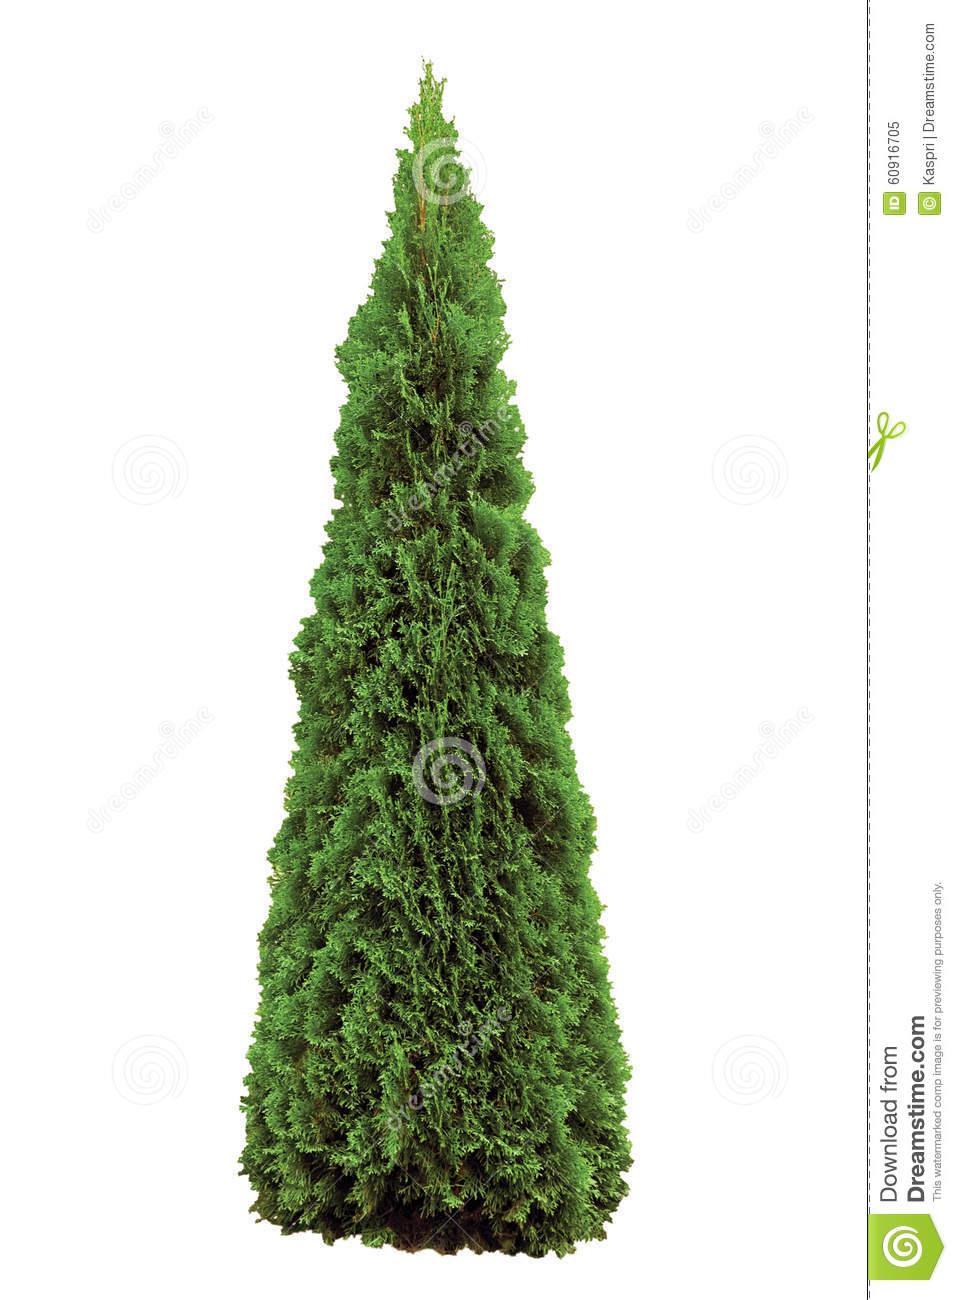 Thuja Occidentalis 'Smaragd', Green American Arborvitae Occidental.